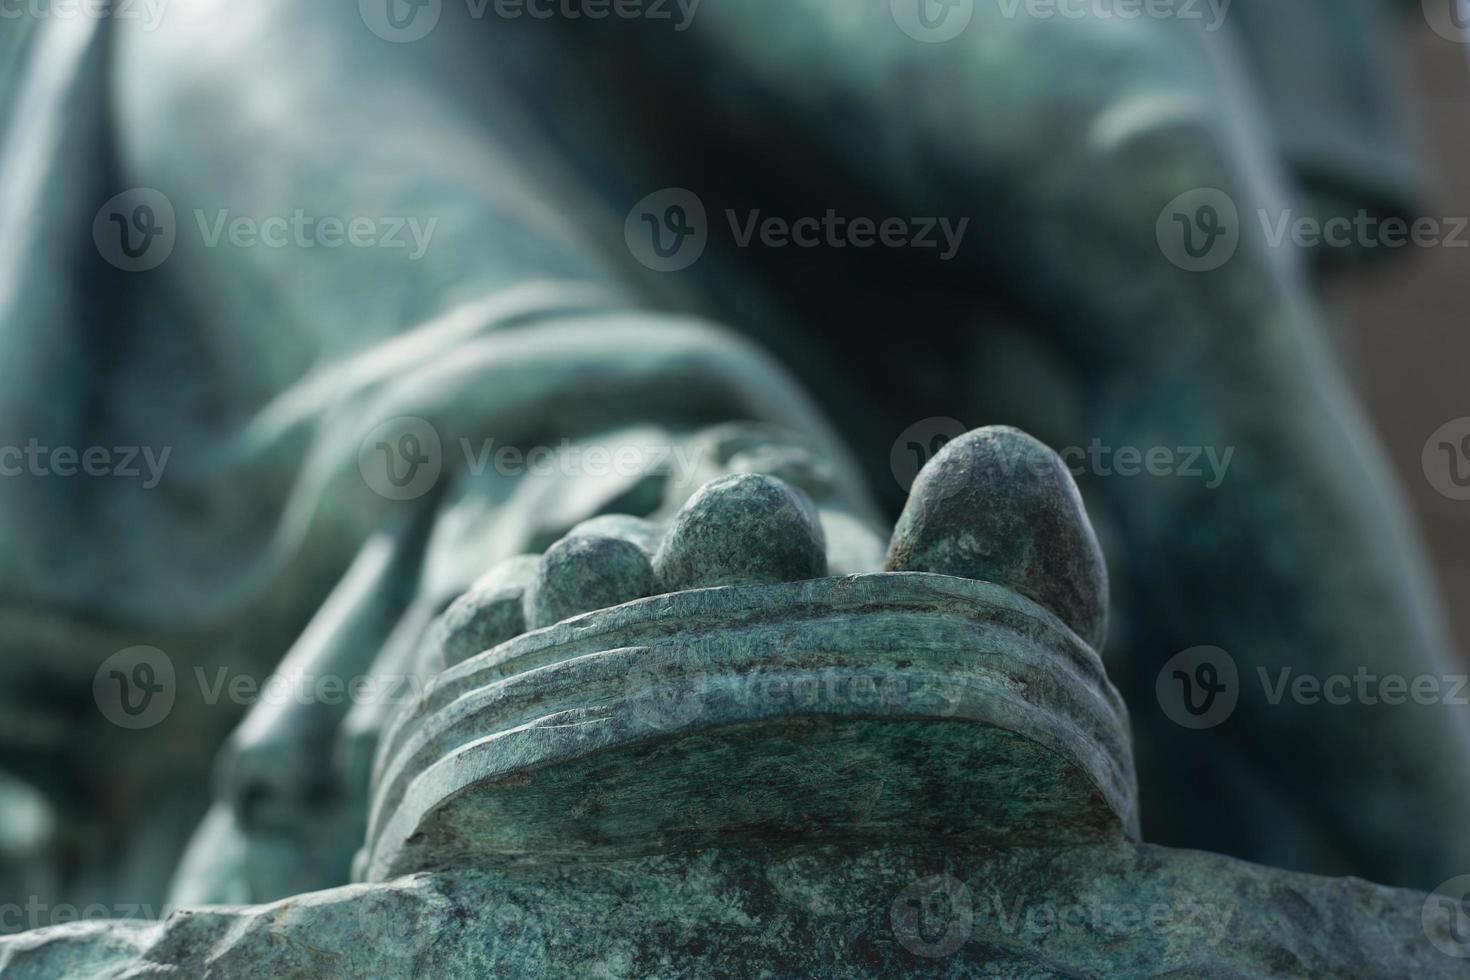 piede sandled verdastro di una statua foto